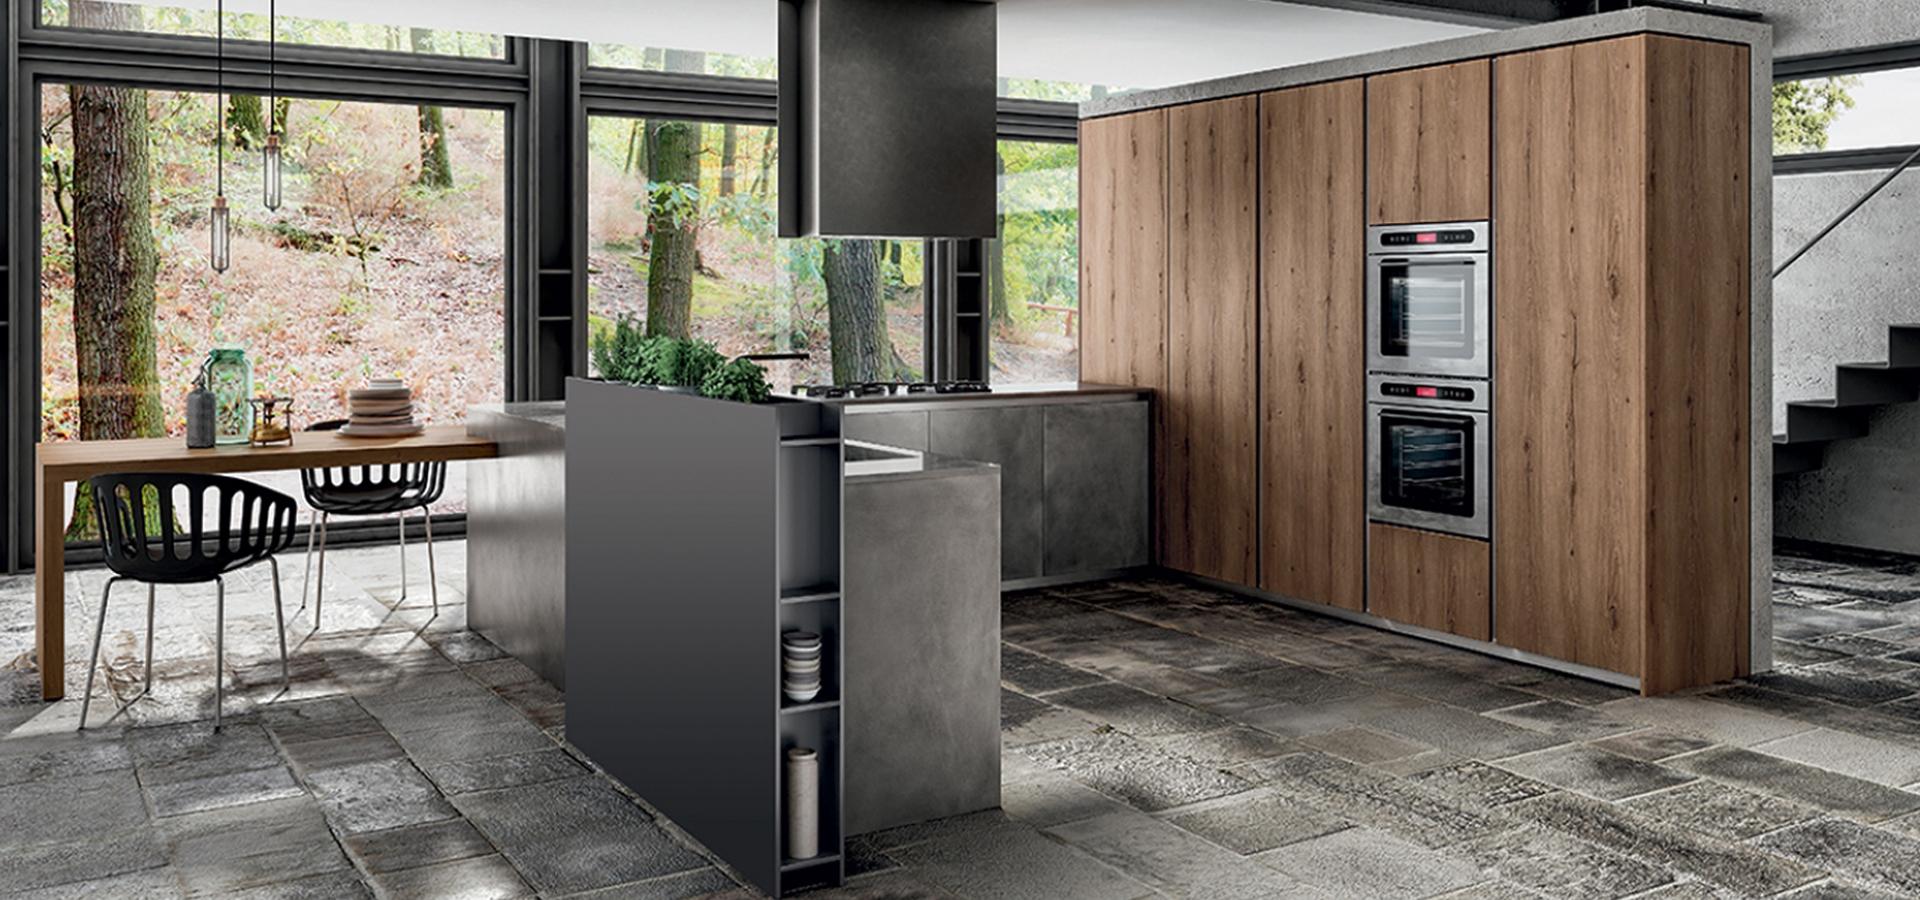 Arredo3-Cucina-Zetasei-3-moderna-design-componibile-angolo-cottura ...